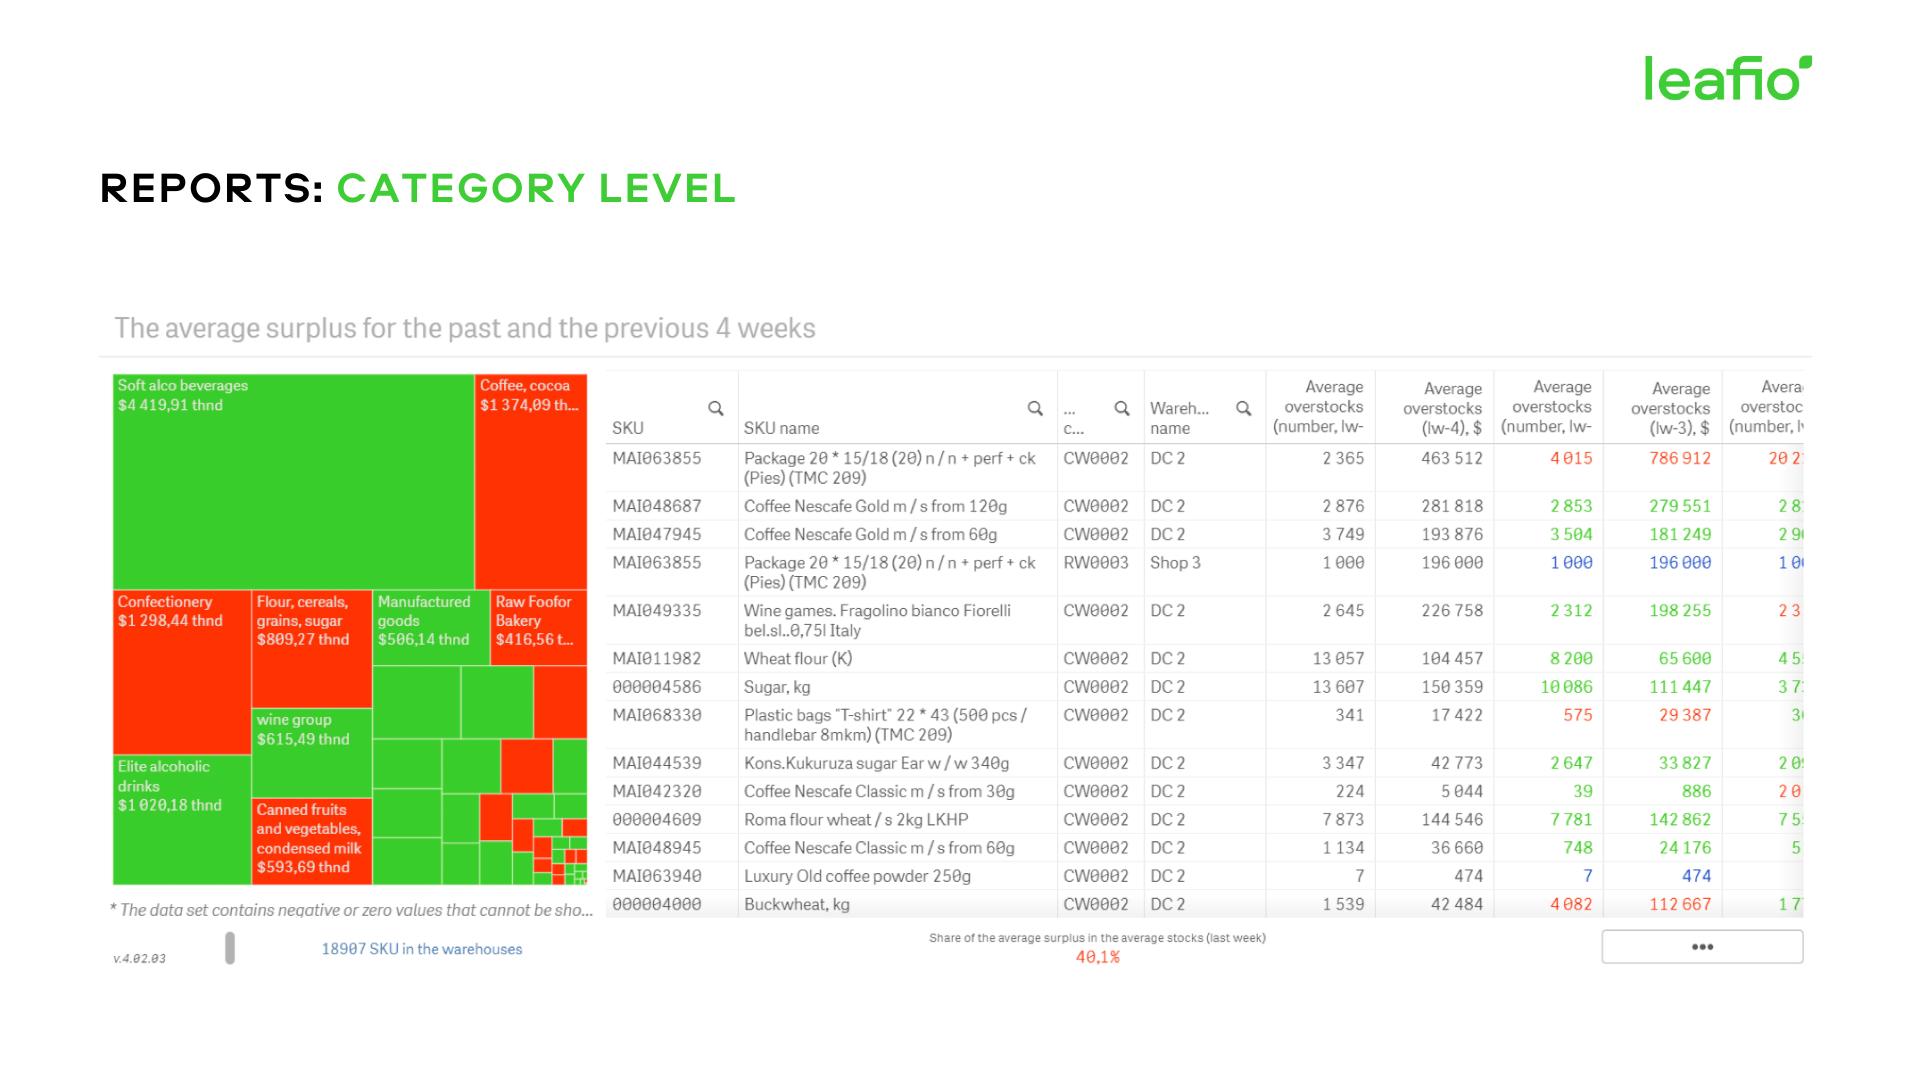 Leafio Inventory Management Software - 3